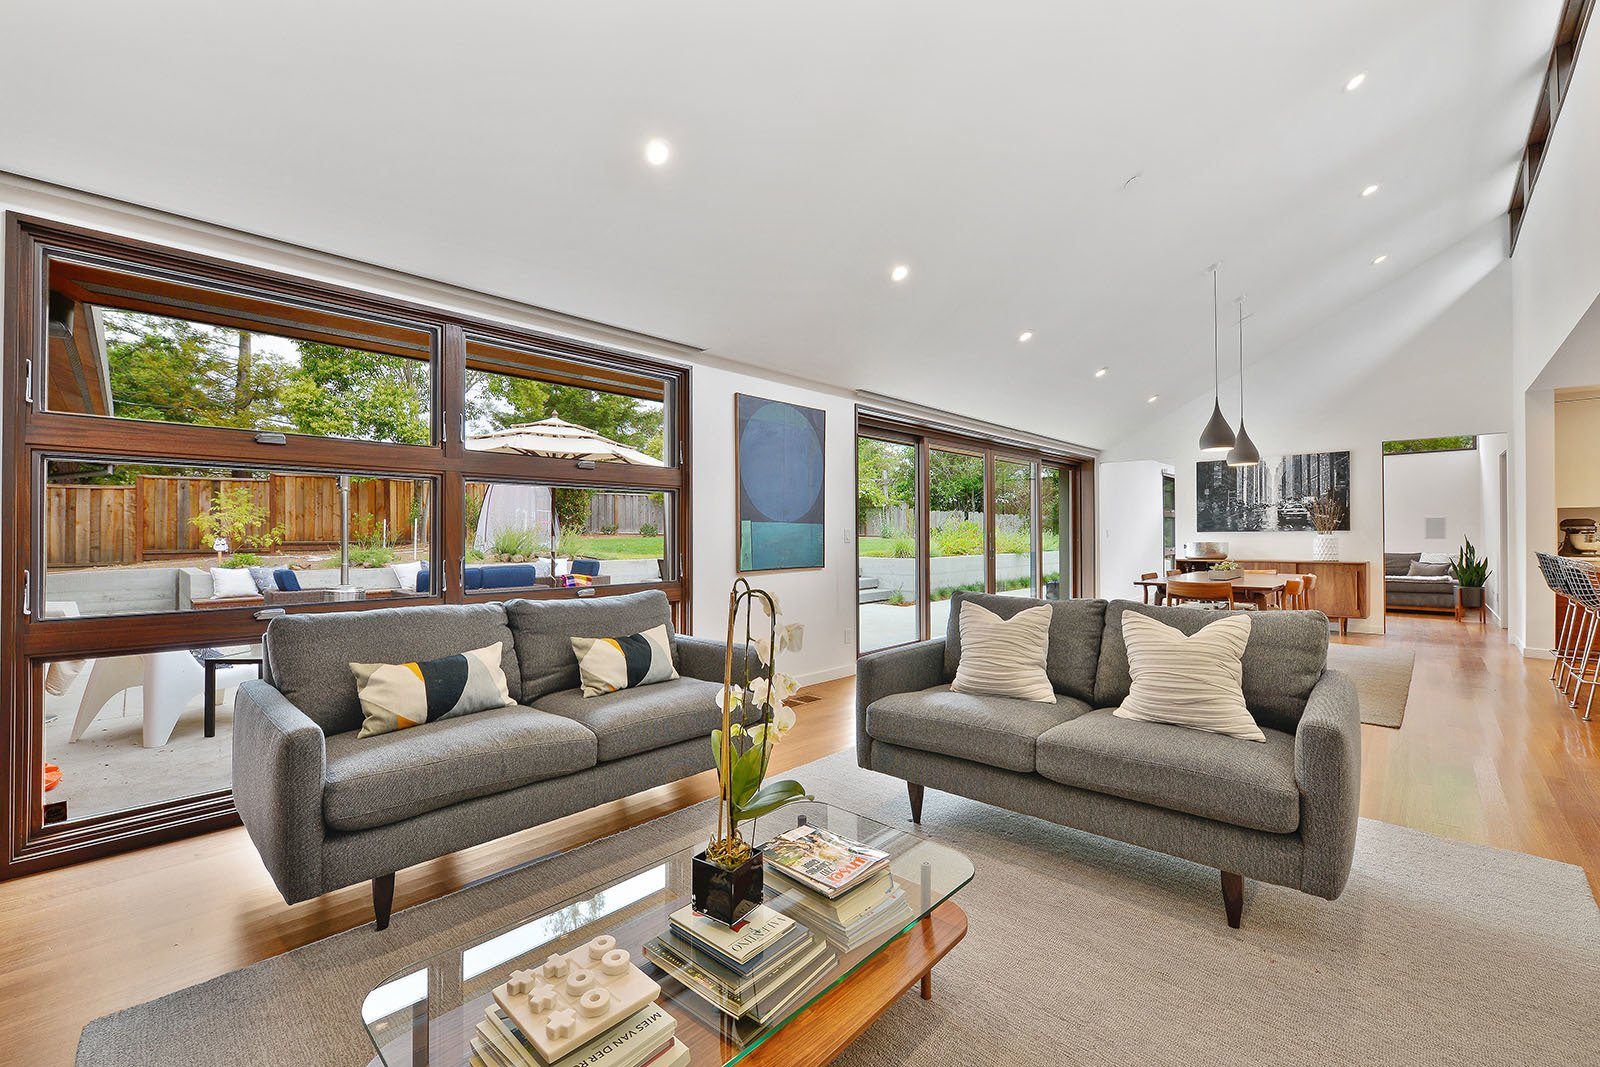 Living room Tagged: Living Room, Coffee Tables, Pendant Lighting, Sofa, Ceiling Lighting, and Medium Hardwood Floor.  Portola Valley by patrick perez/designpad architecture